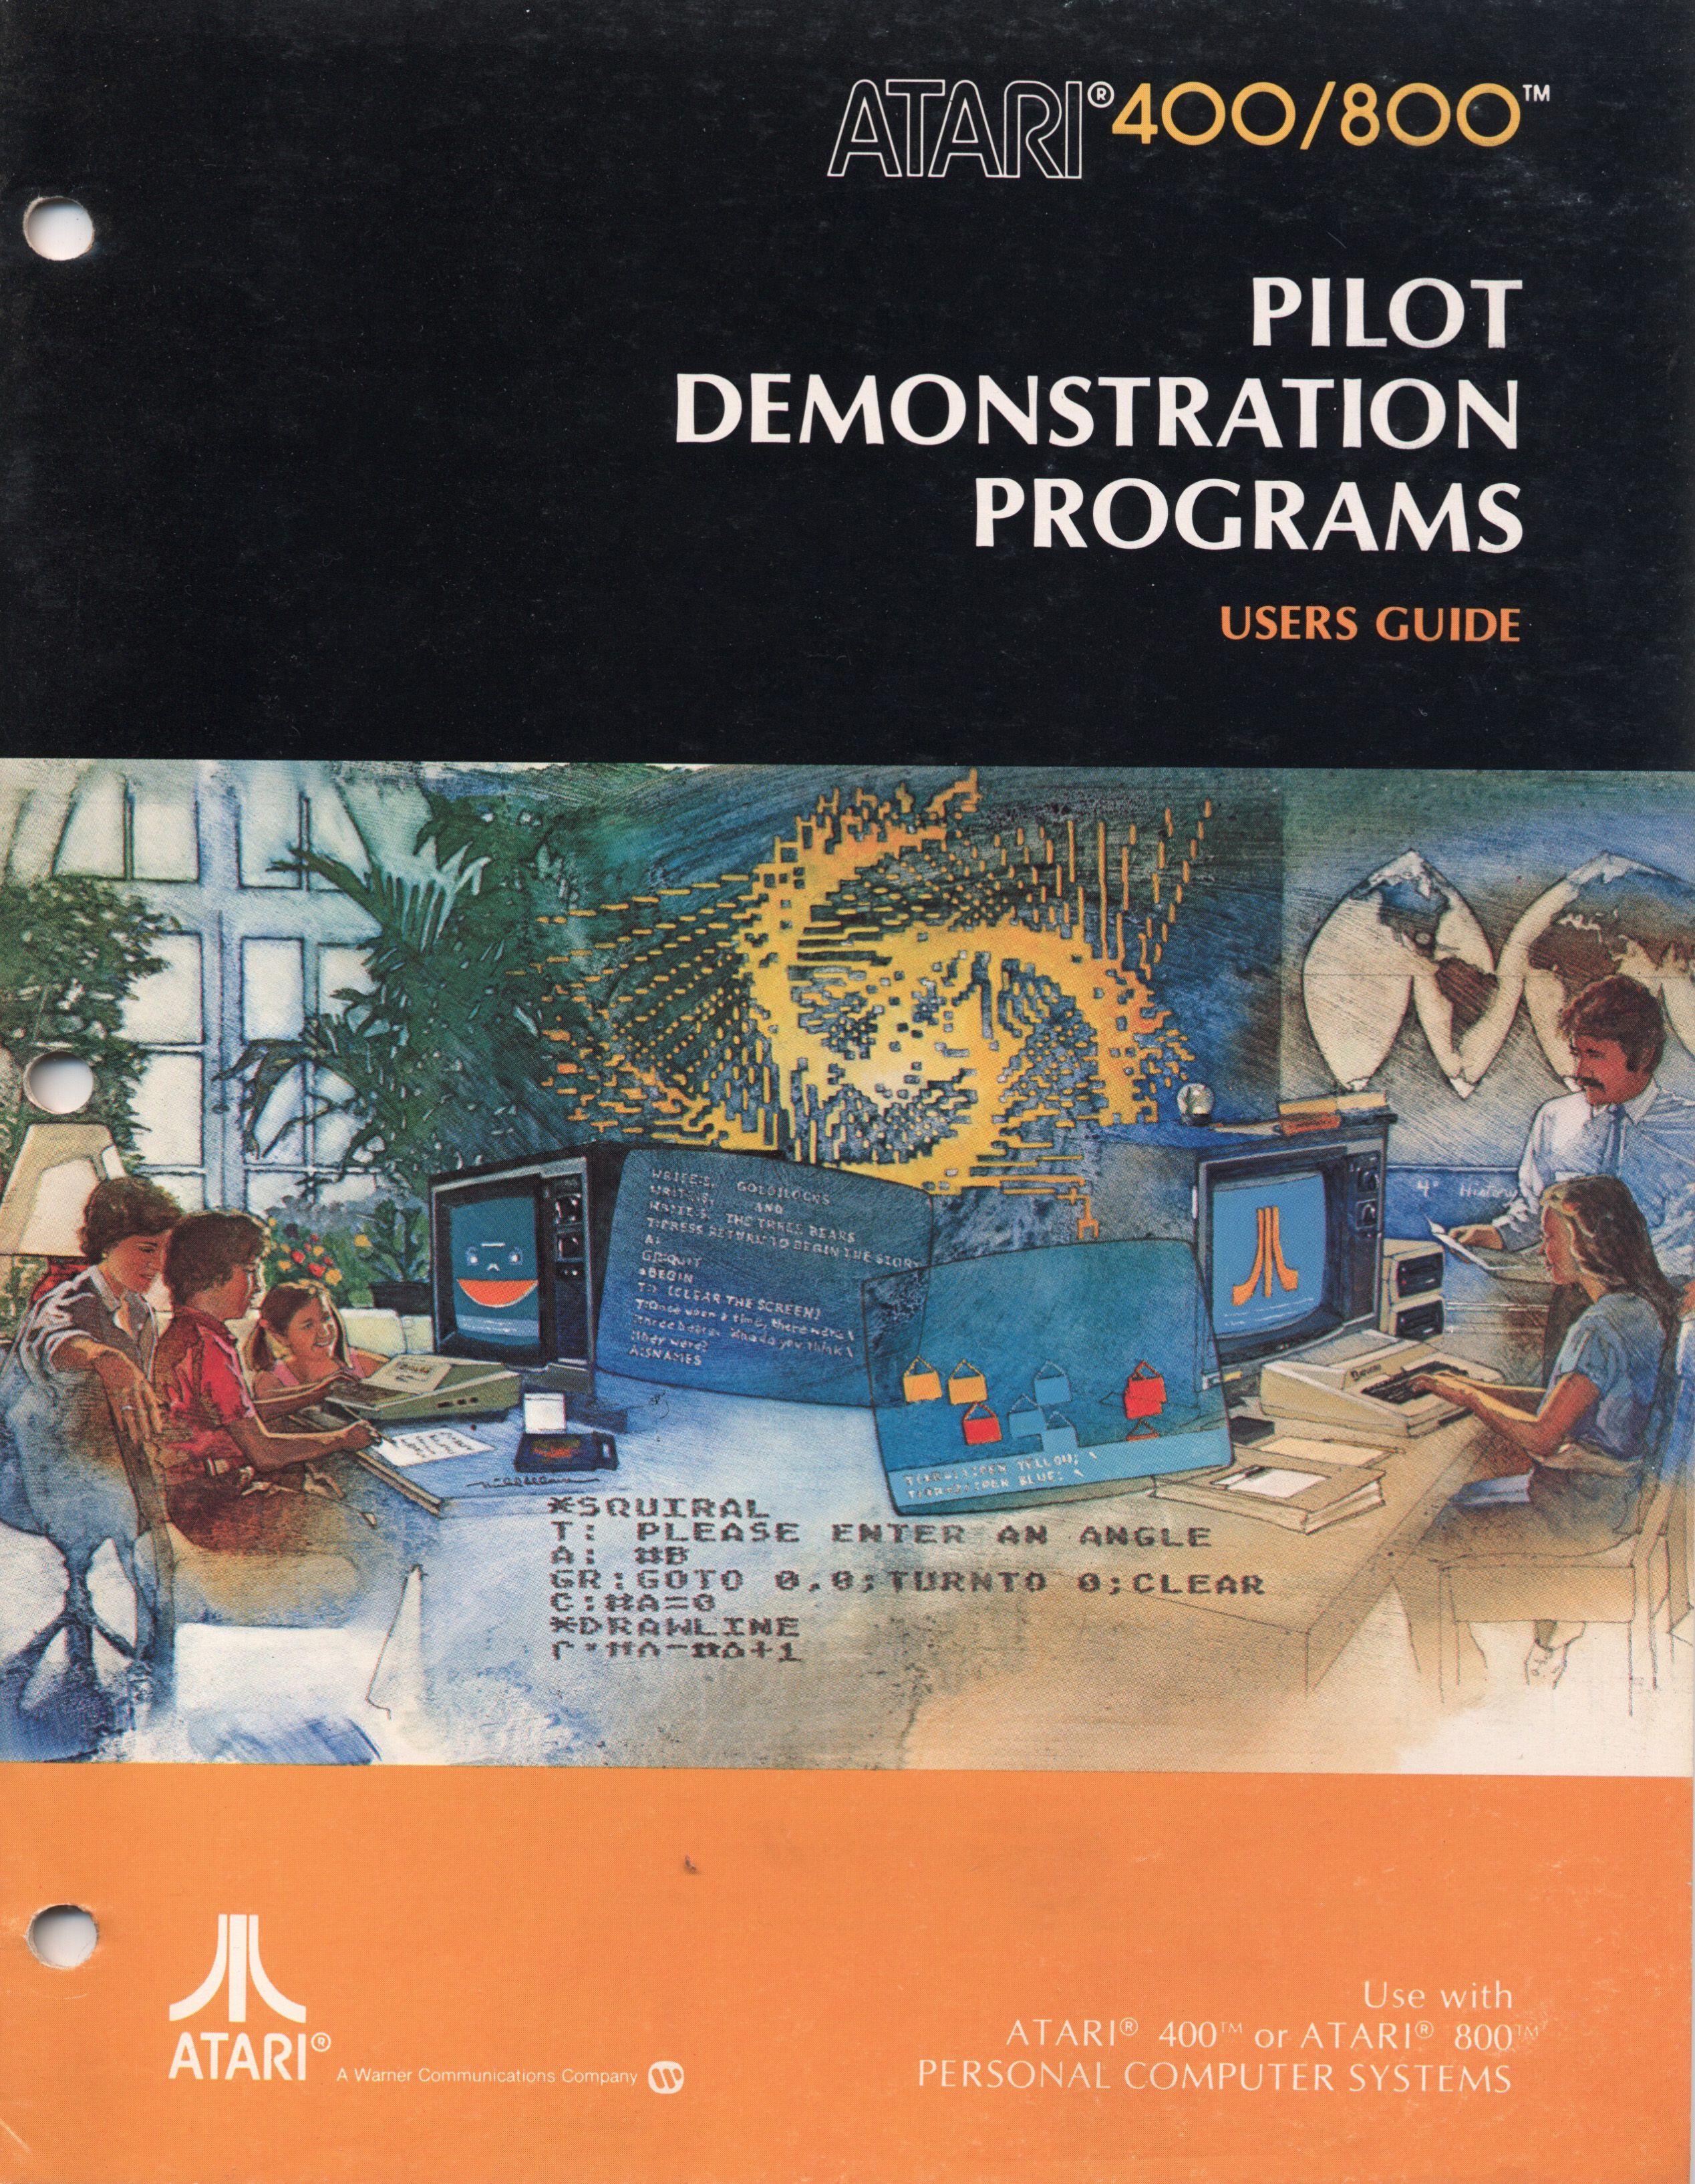 ATARI Pilot Demonstration Programs Computer history